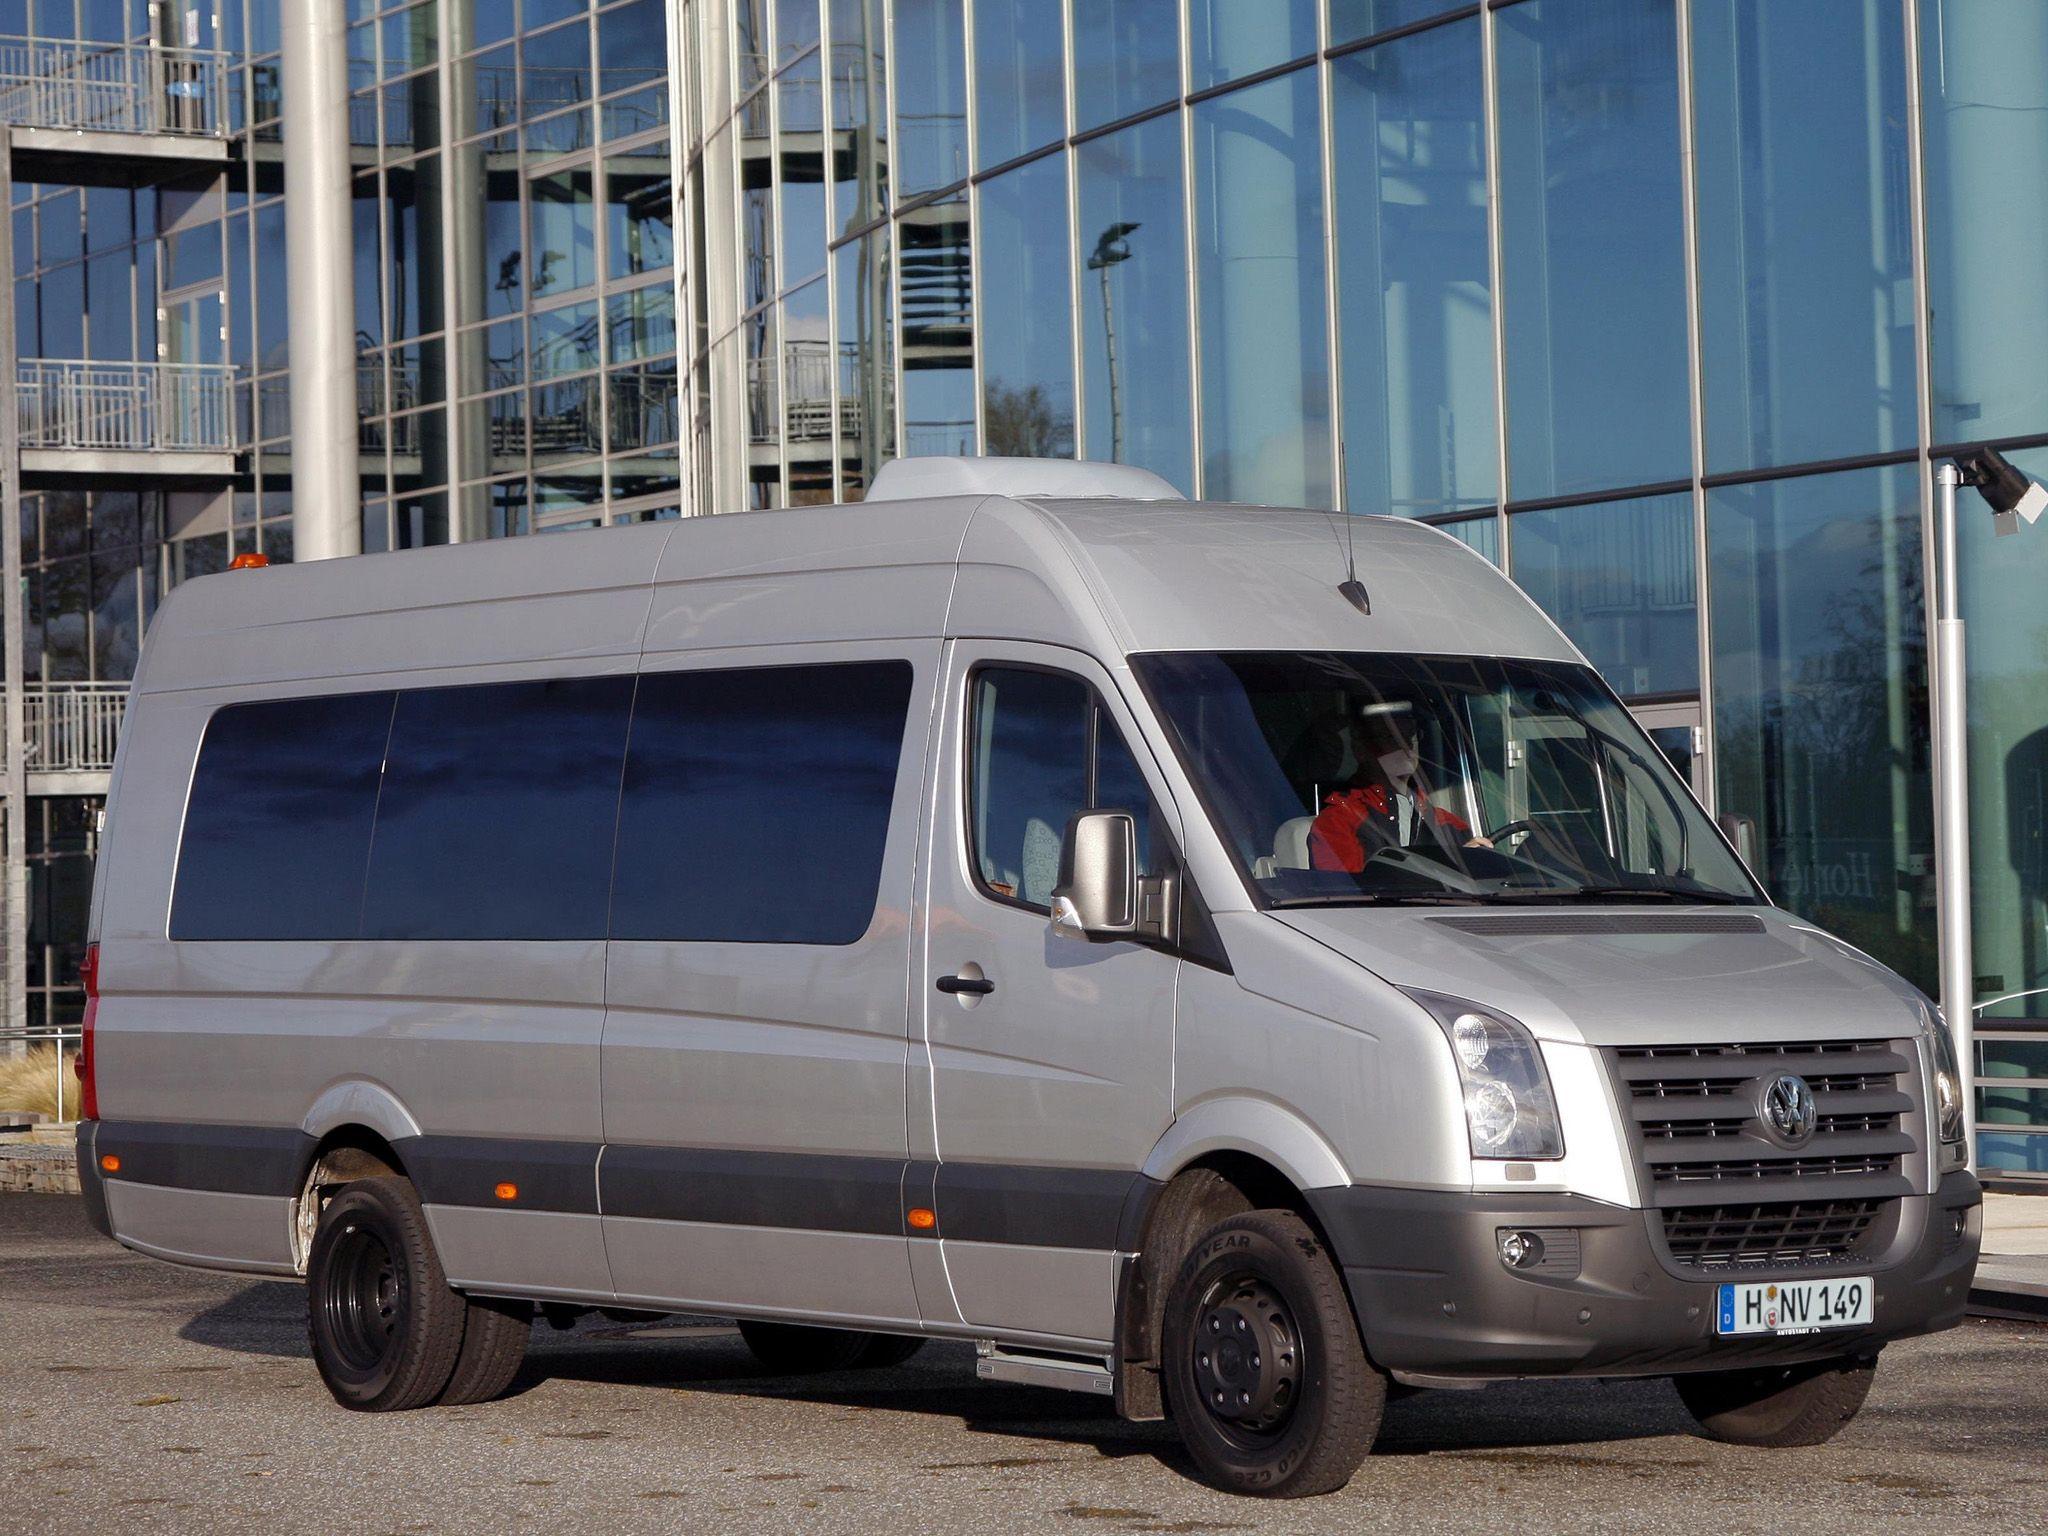 арендовать volkswagen crafter 2012 года 6 человек